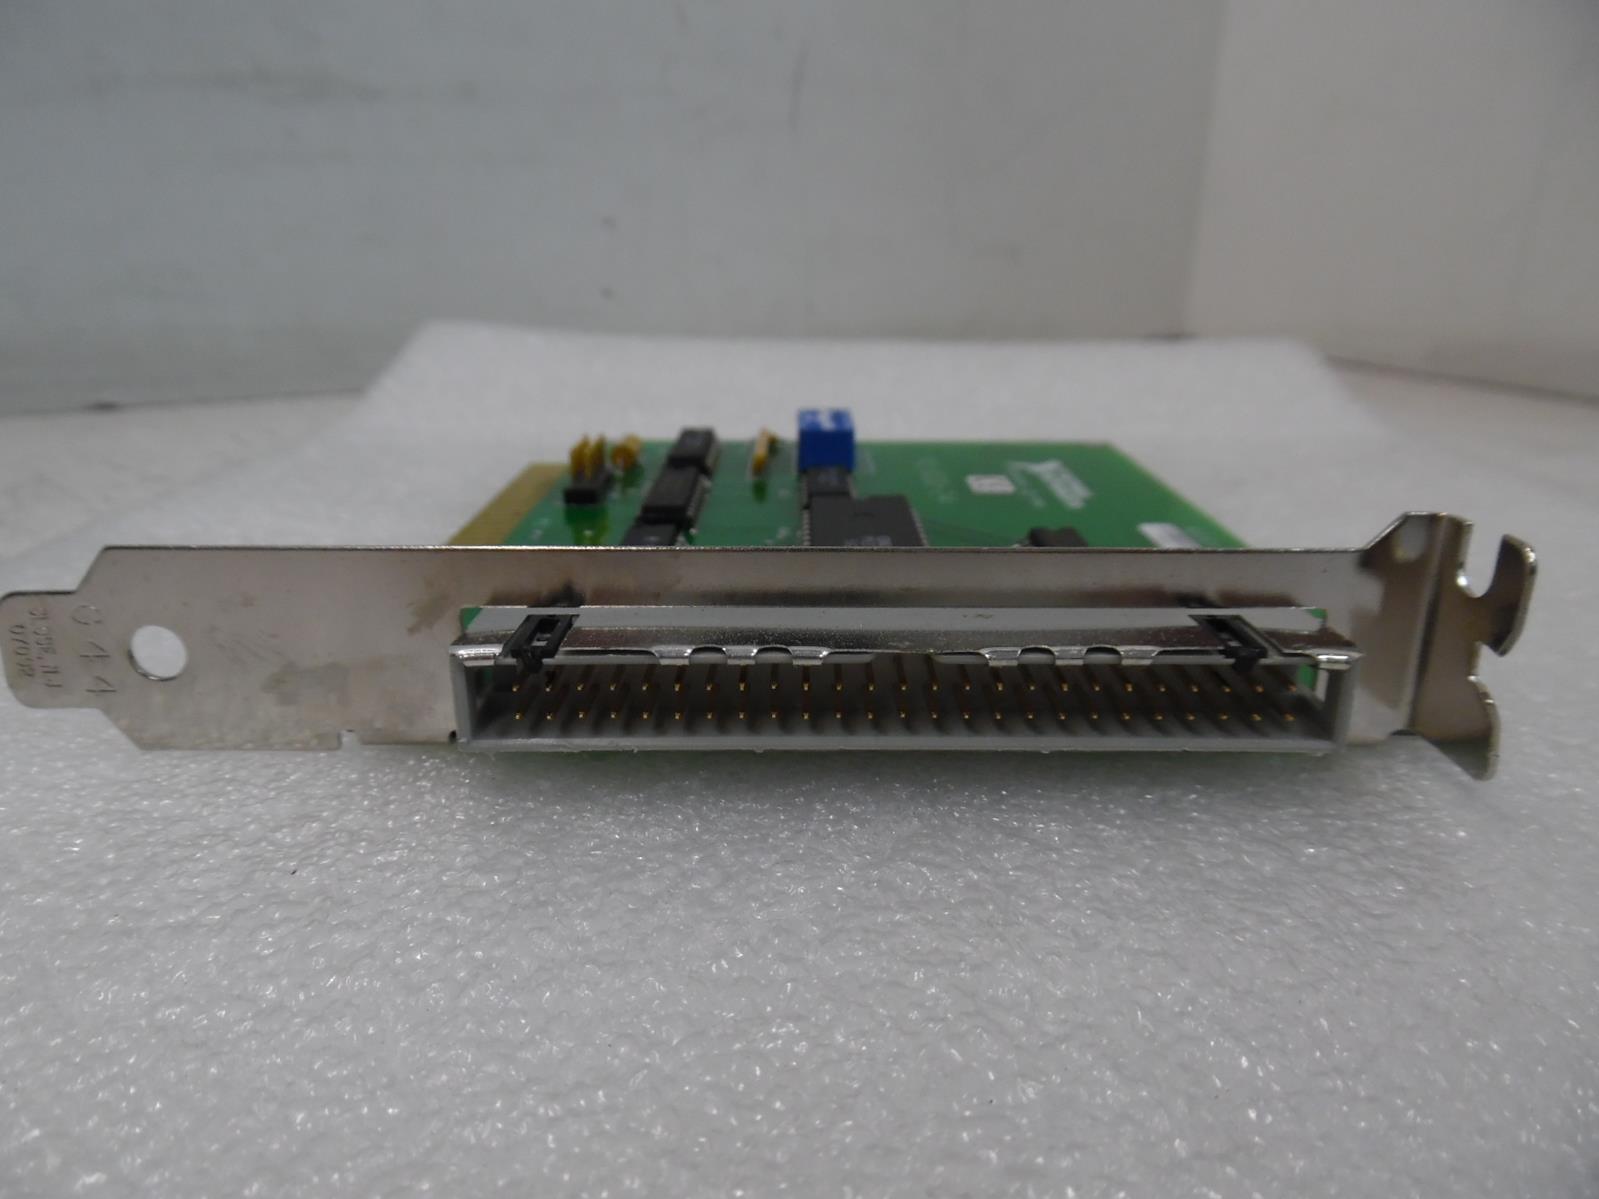 NATIONAL INSTRUMENTS PCI-8232 PCI-8232 GIGABIT CARD 169761A-01